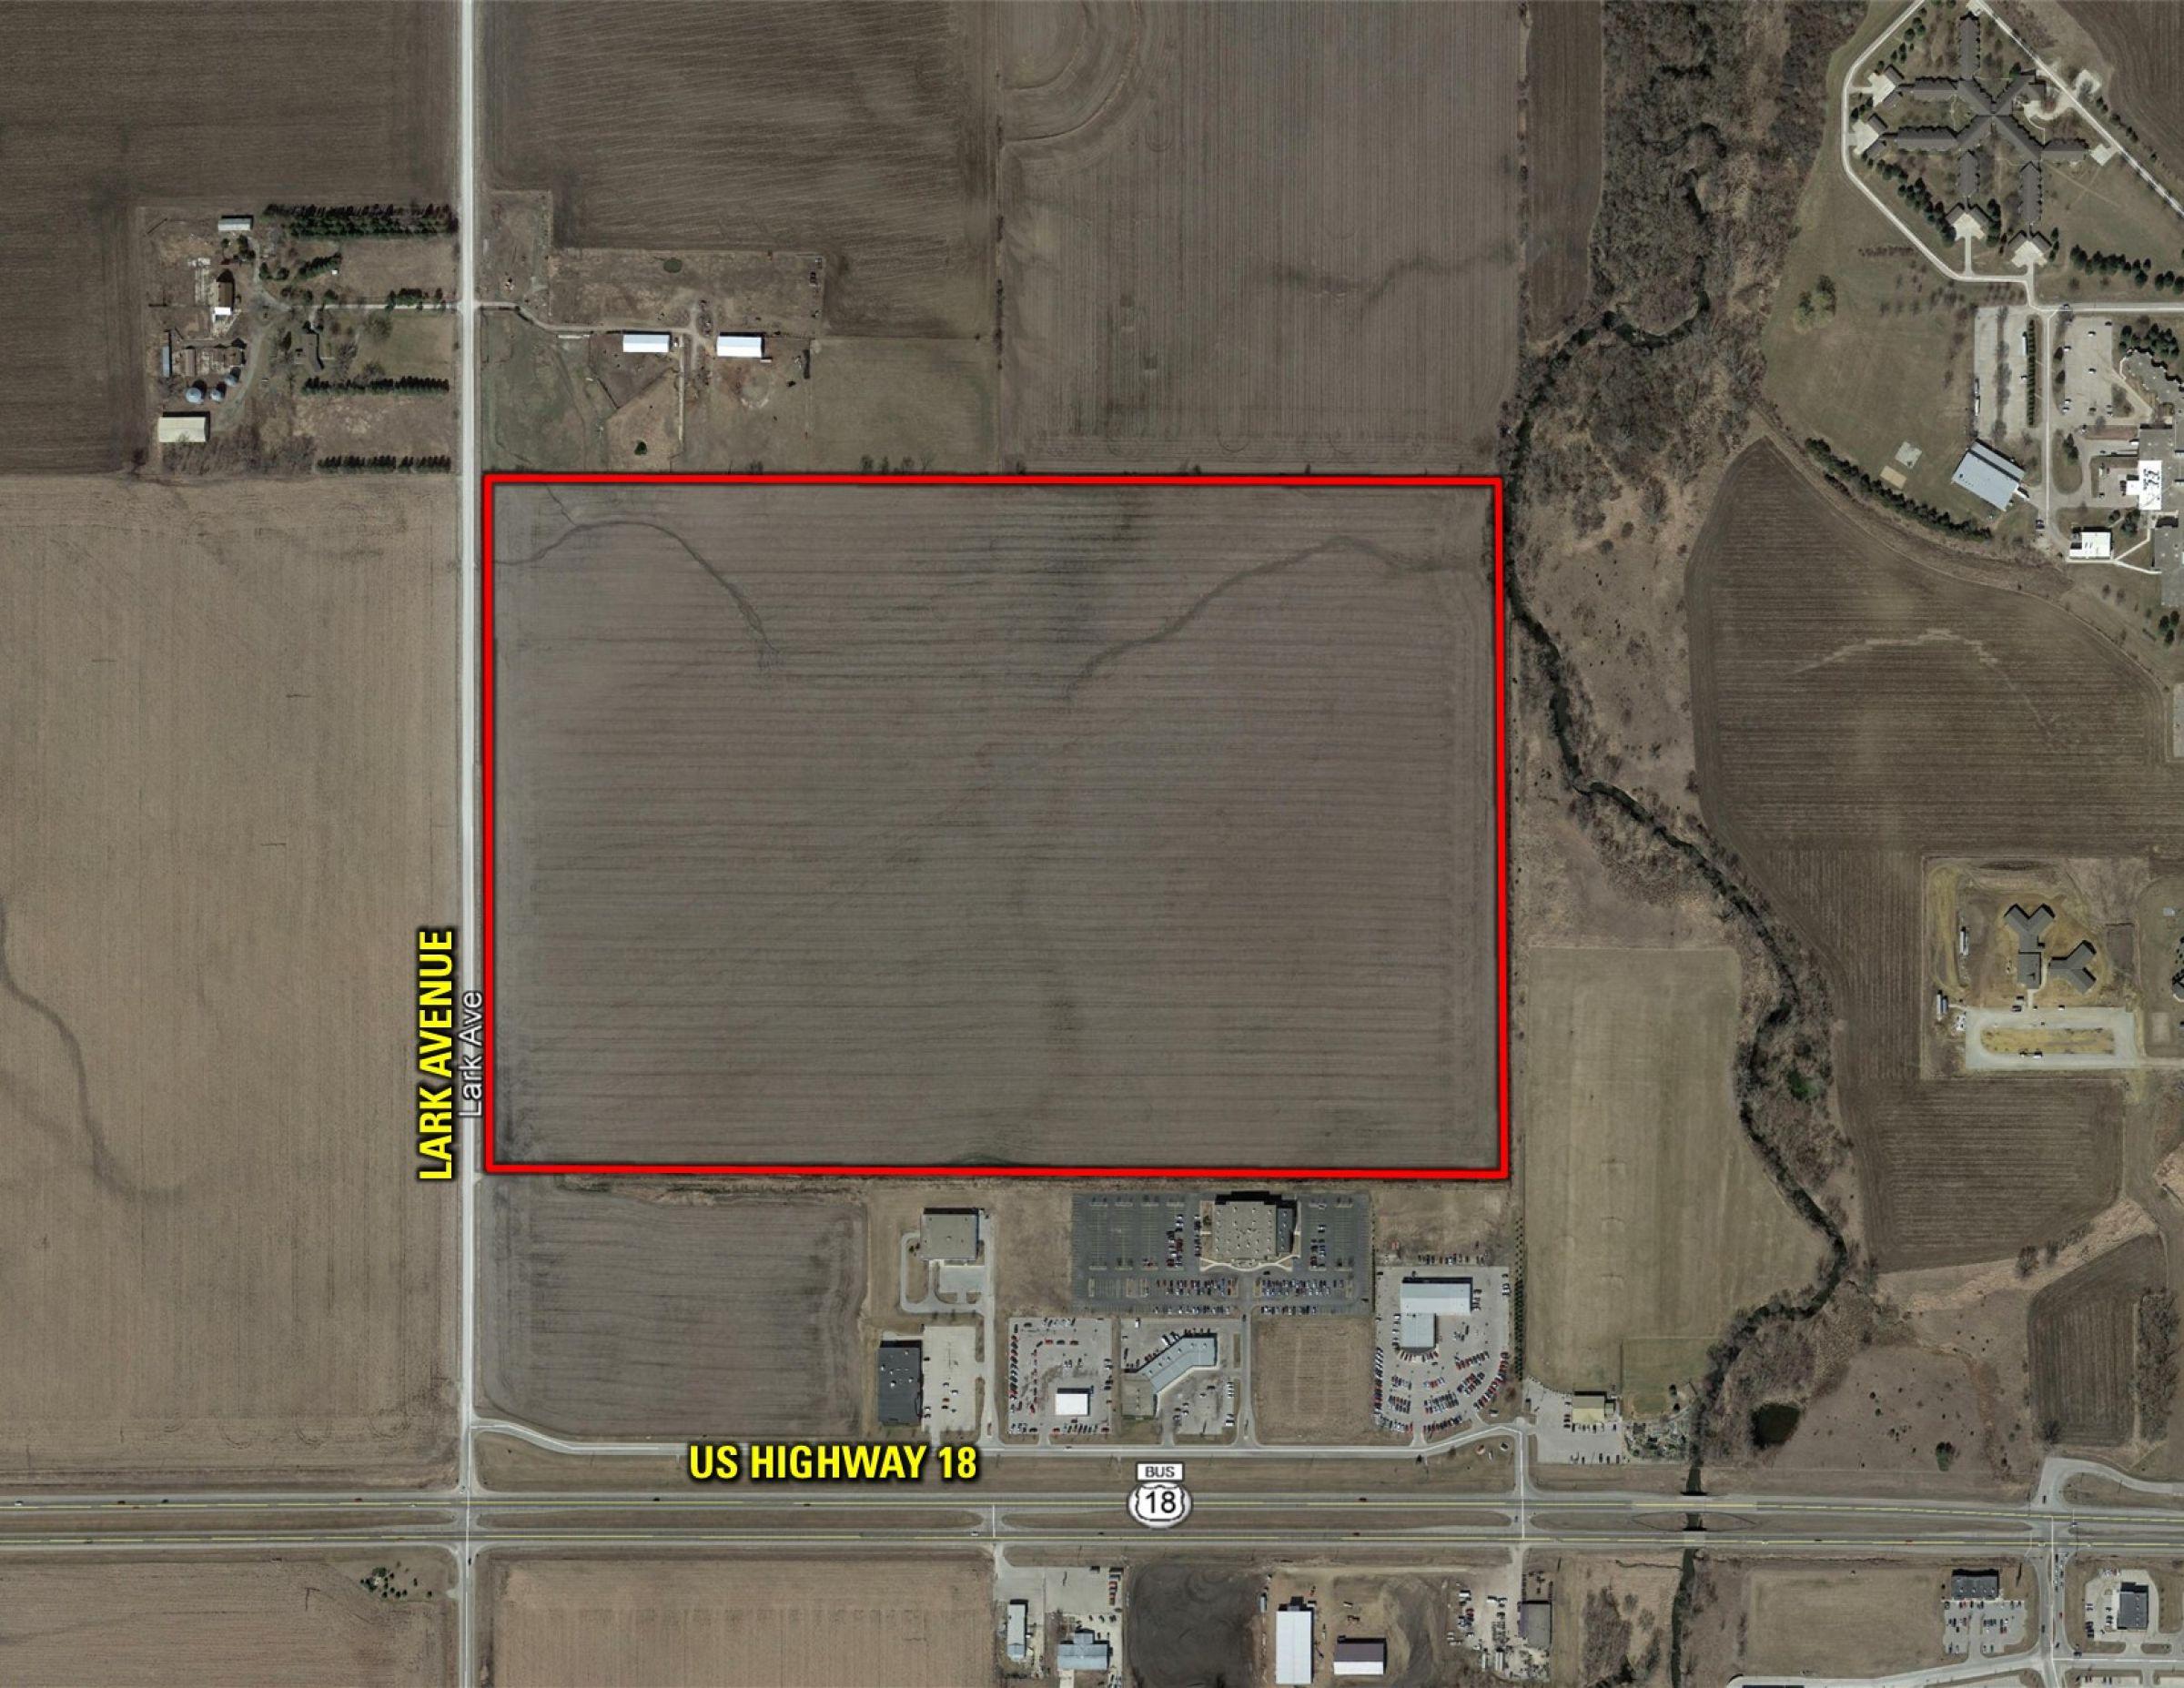 development-land-commercial-cerro-gordo-county-iowa-108-acres-listing-number-15644-0-2021-07-20-022751.jpg